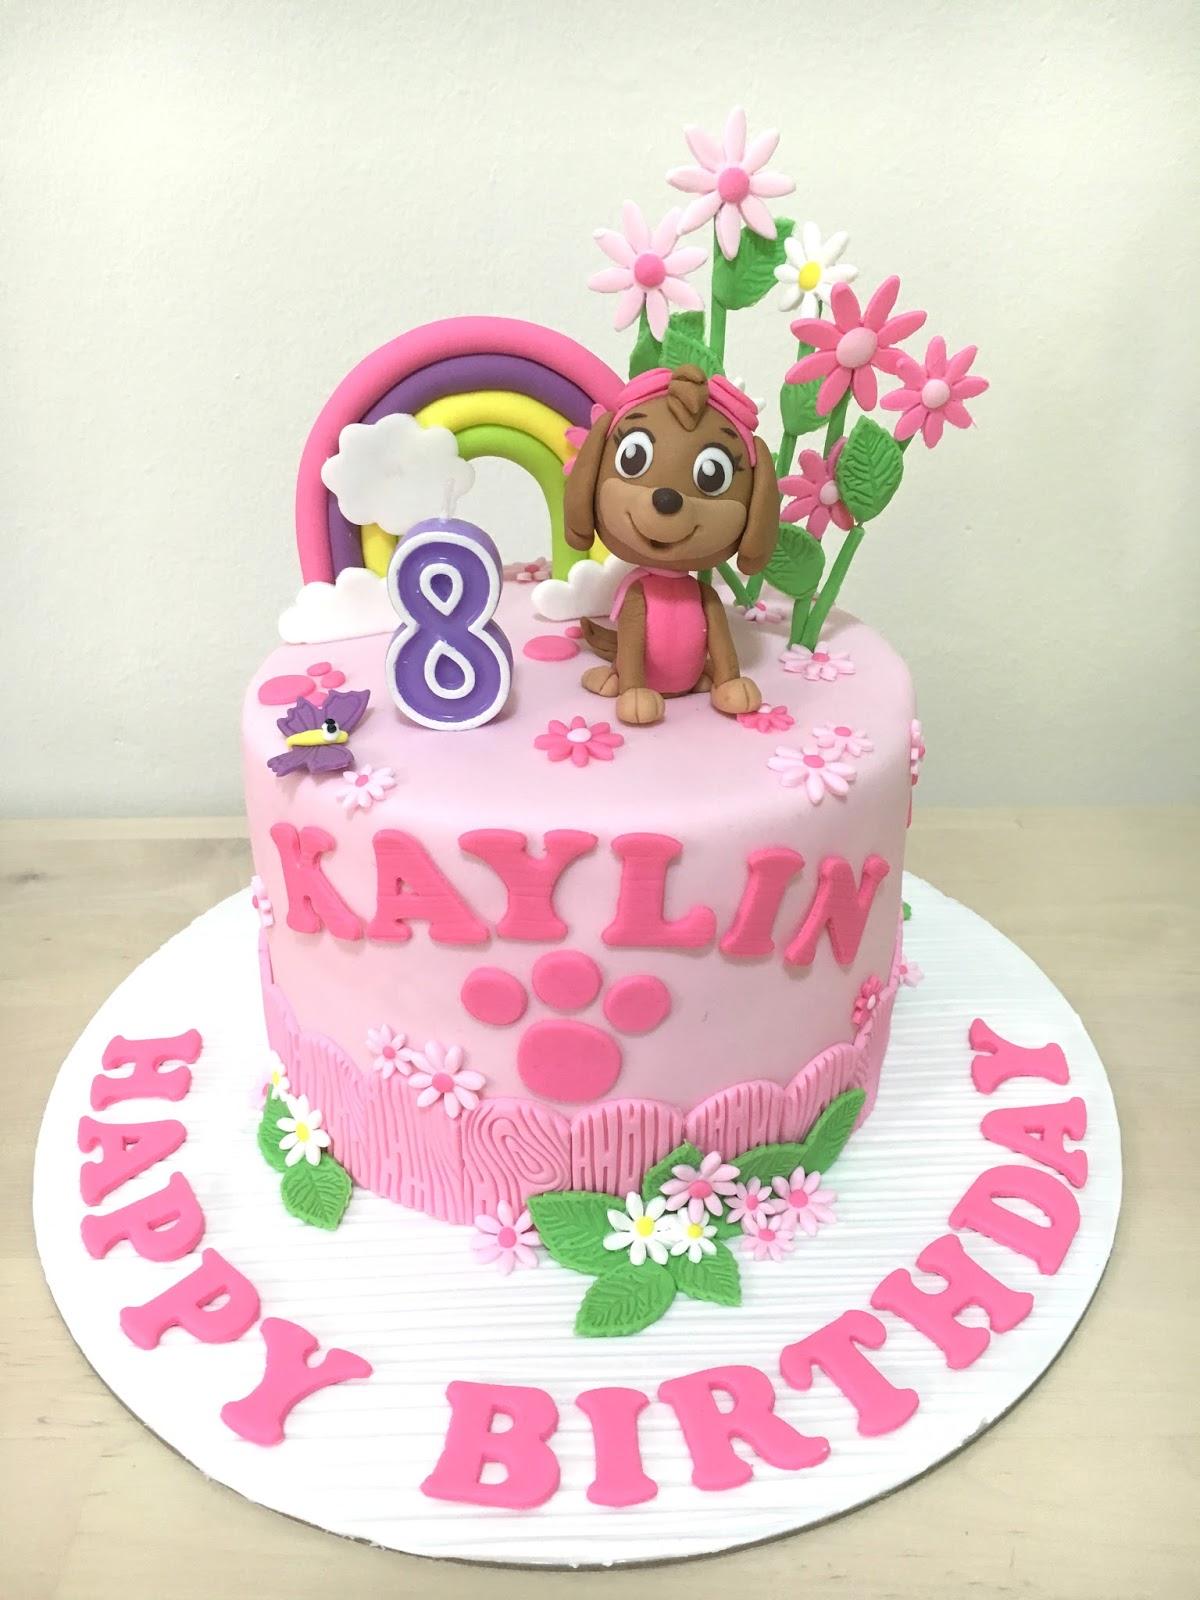 Oven Creations Happy 8th Birthday Kaylin